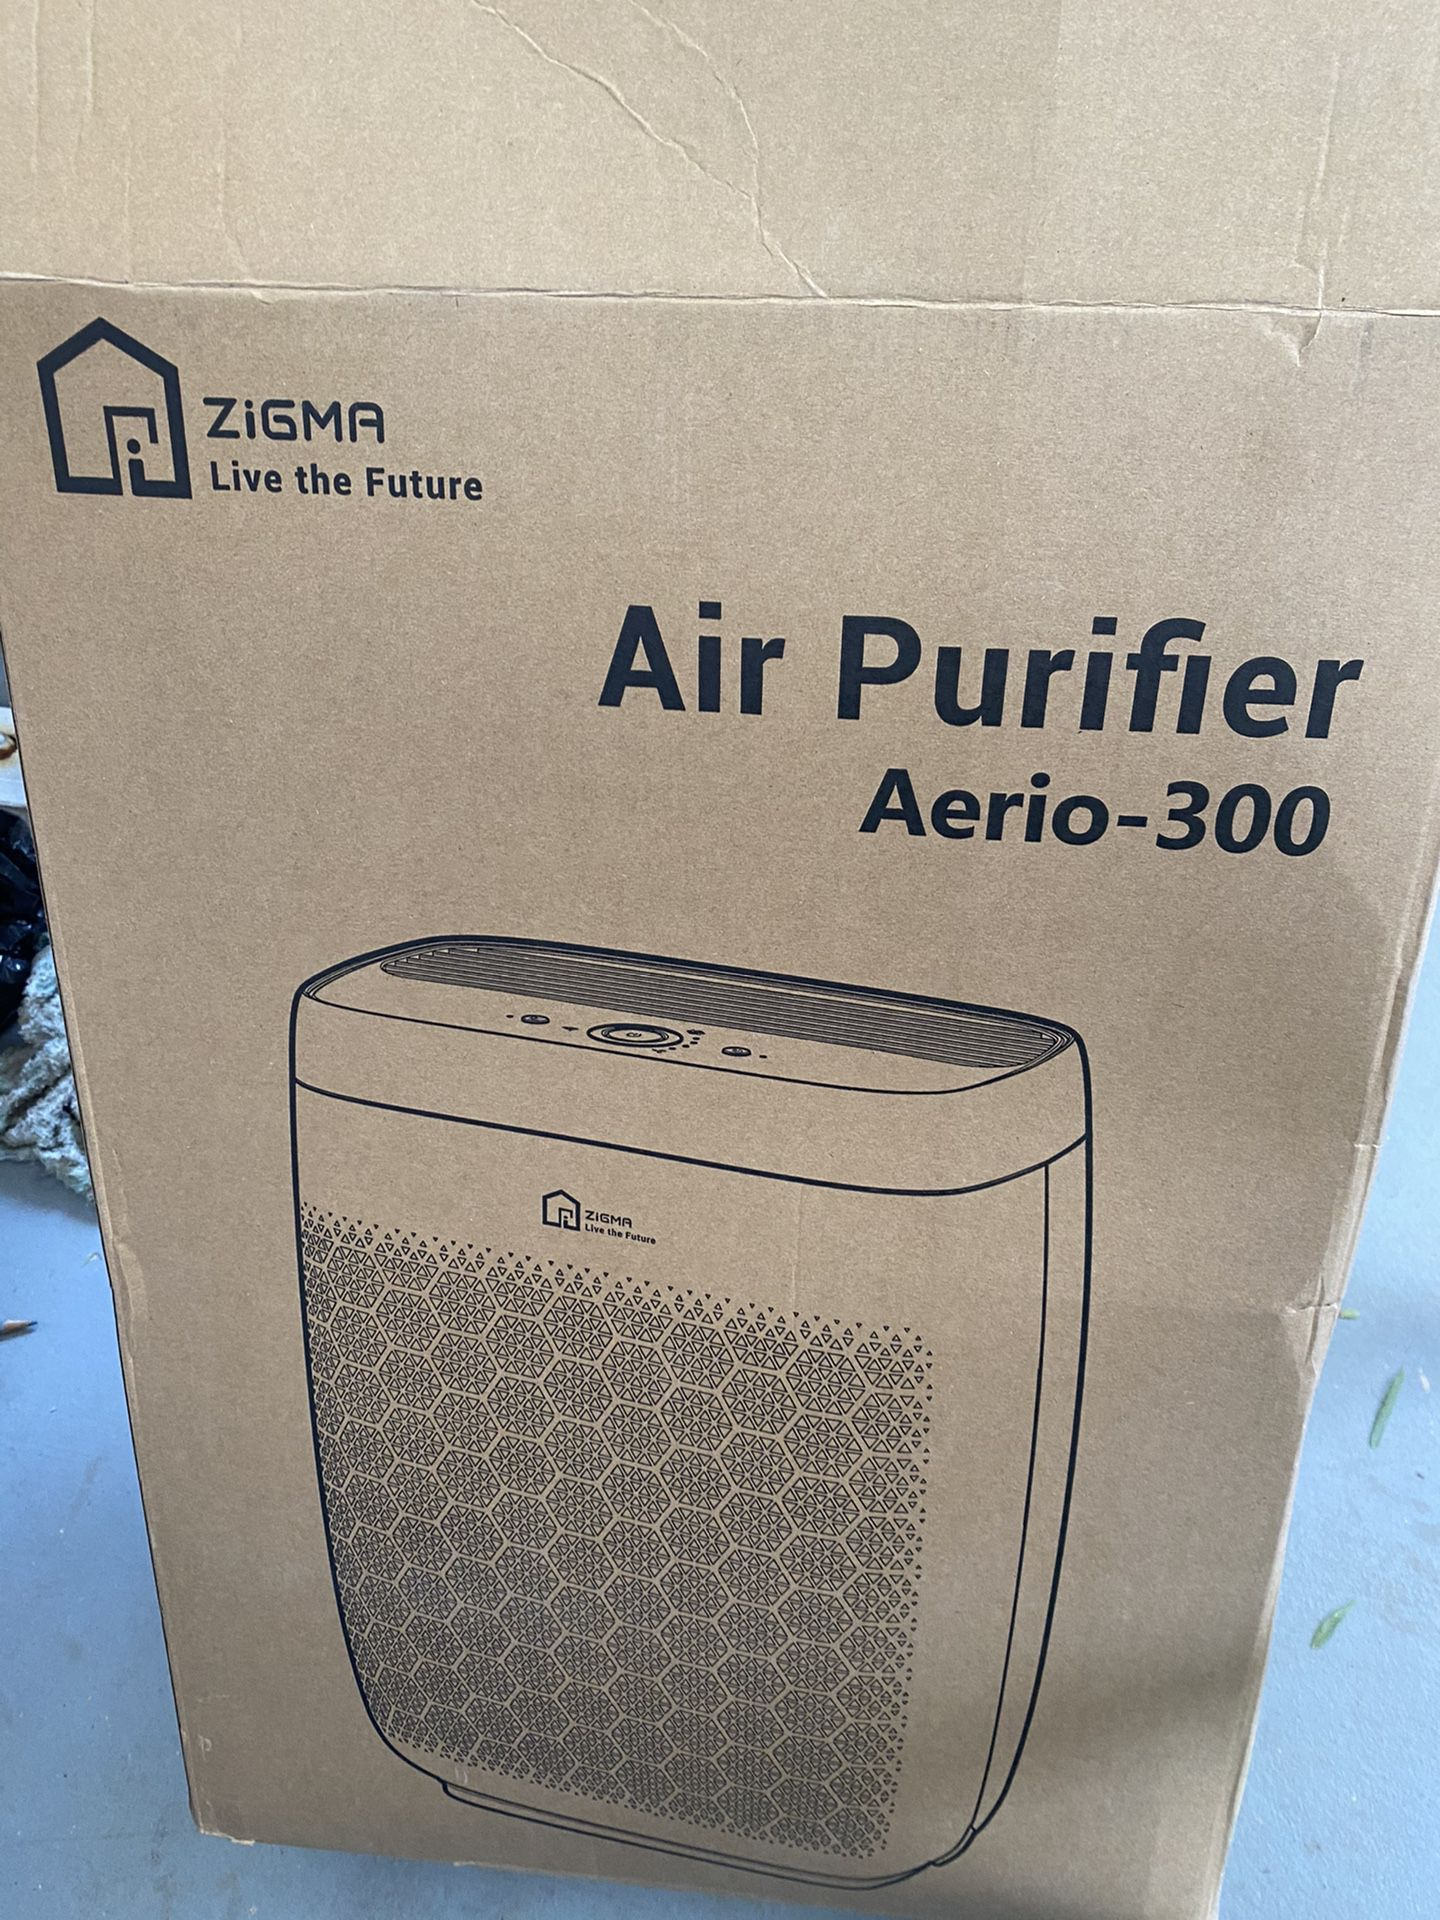 Zigma Air Purifier